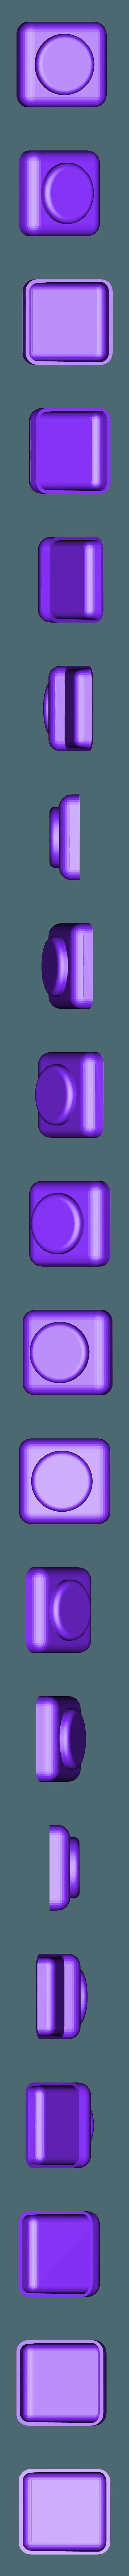 Endcap_-_Rick_Version.stl Download free STL file 9 gague plasma pistol with barrel tip cover (MPMS mini) • 3D print template, PM_ME_YOUR_VALUE